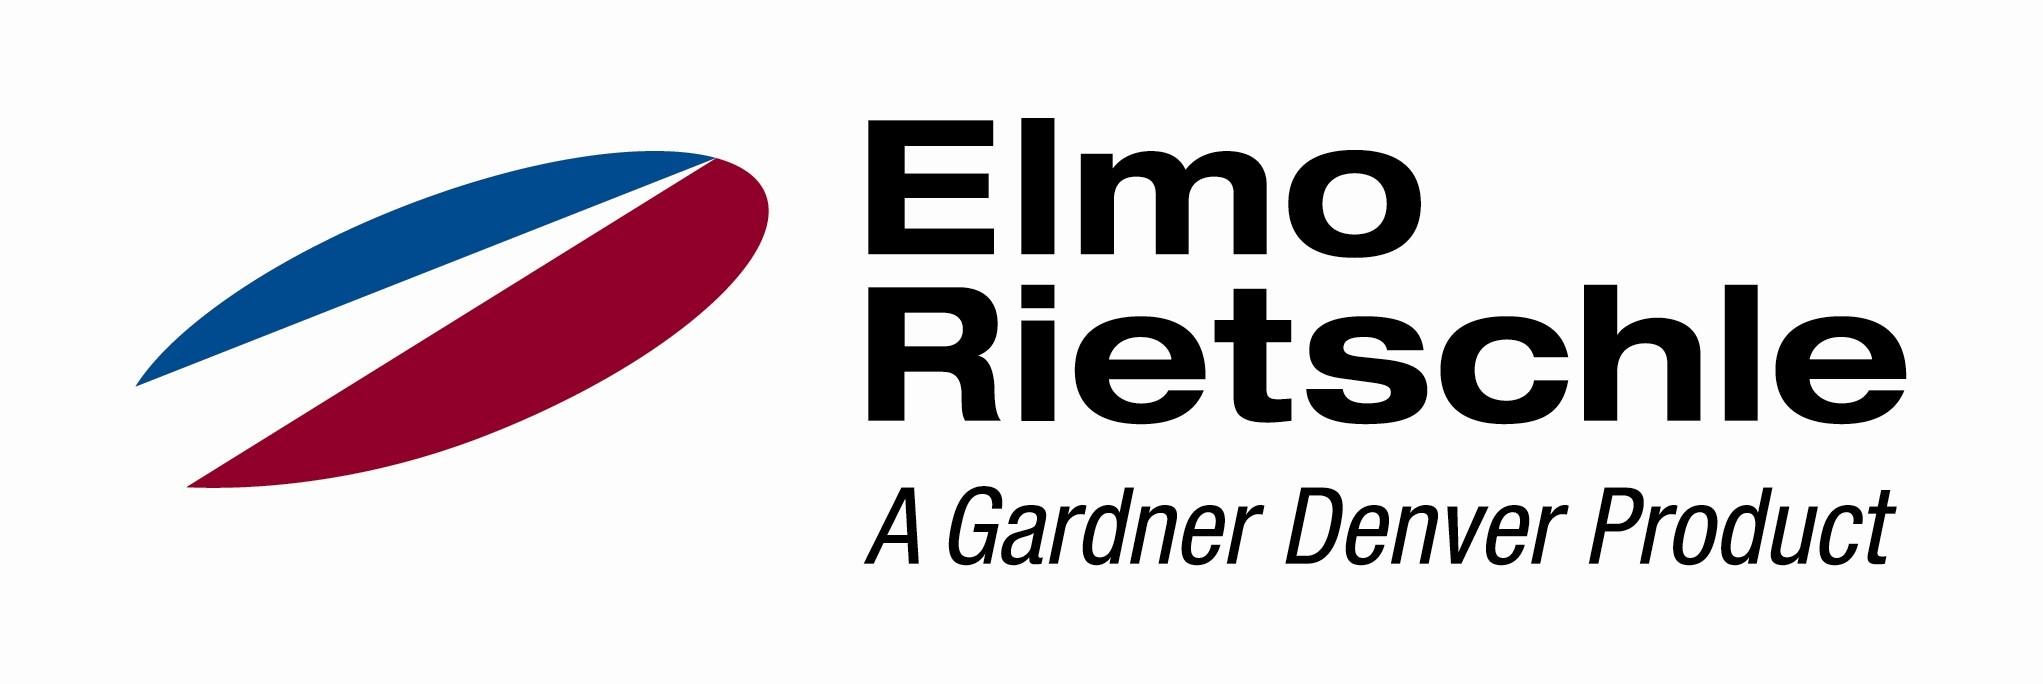 Elmo-Rietschle_logo